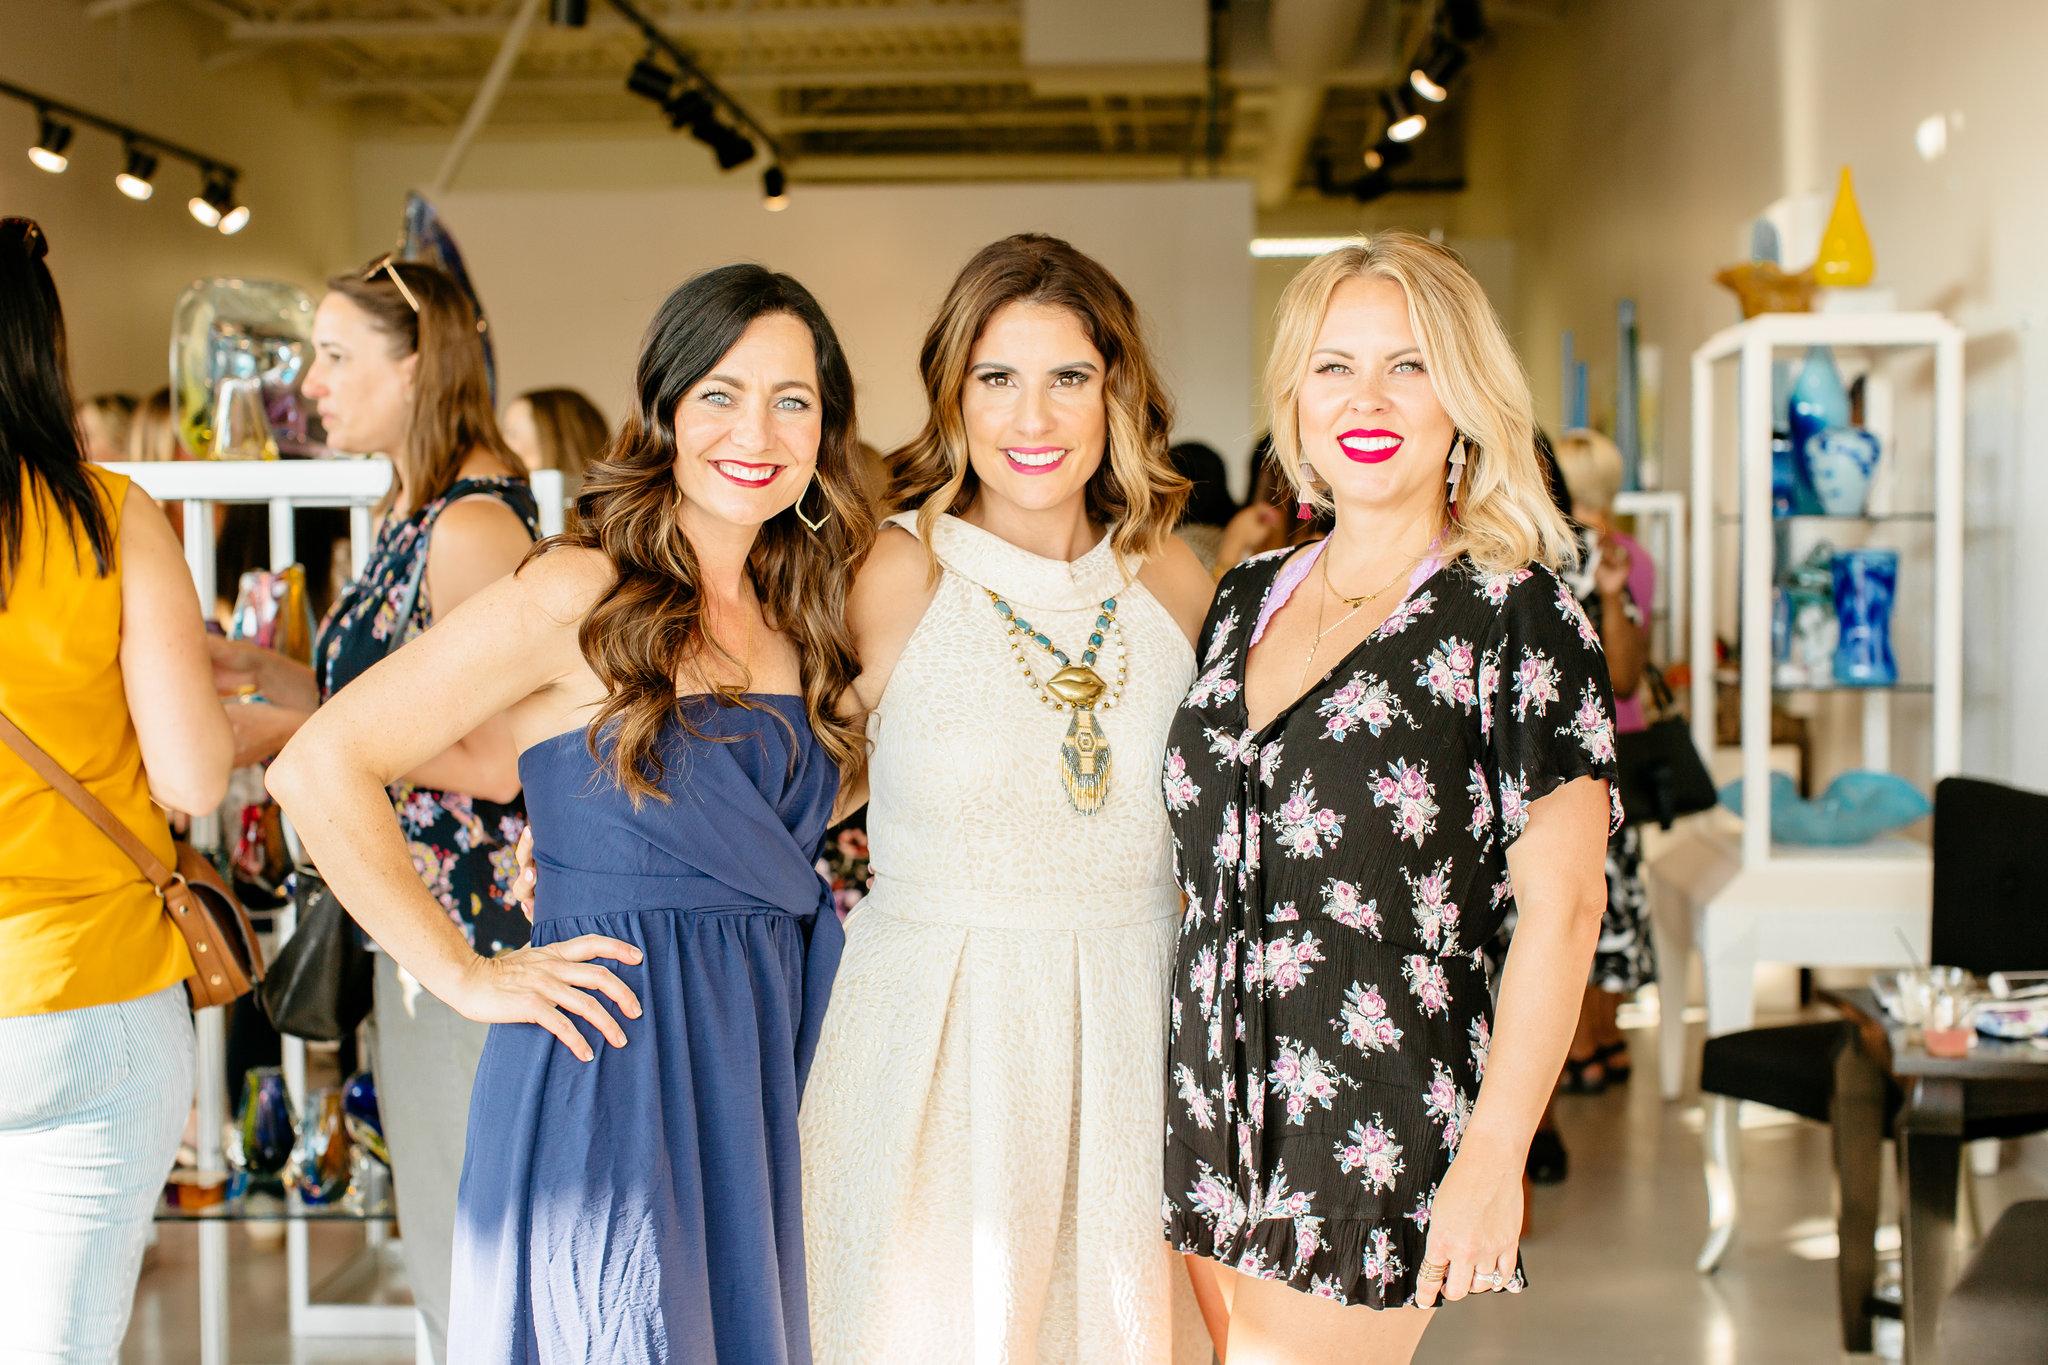 Alexa-Vossler-Photo_Dallas-Event-Photographer_Brite-Bar-Beauty-2018-Lipstick-Launch-Party-120.jpg